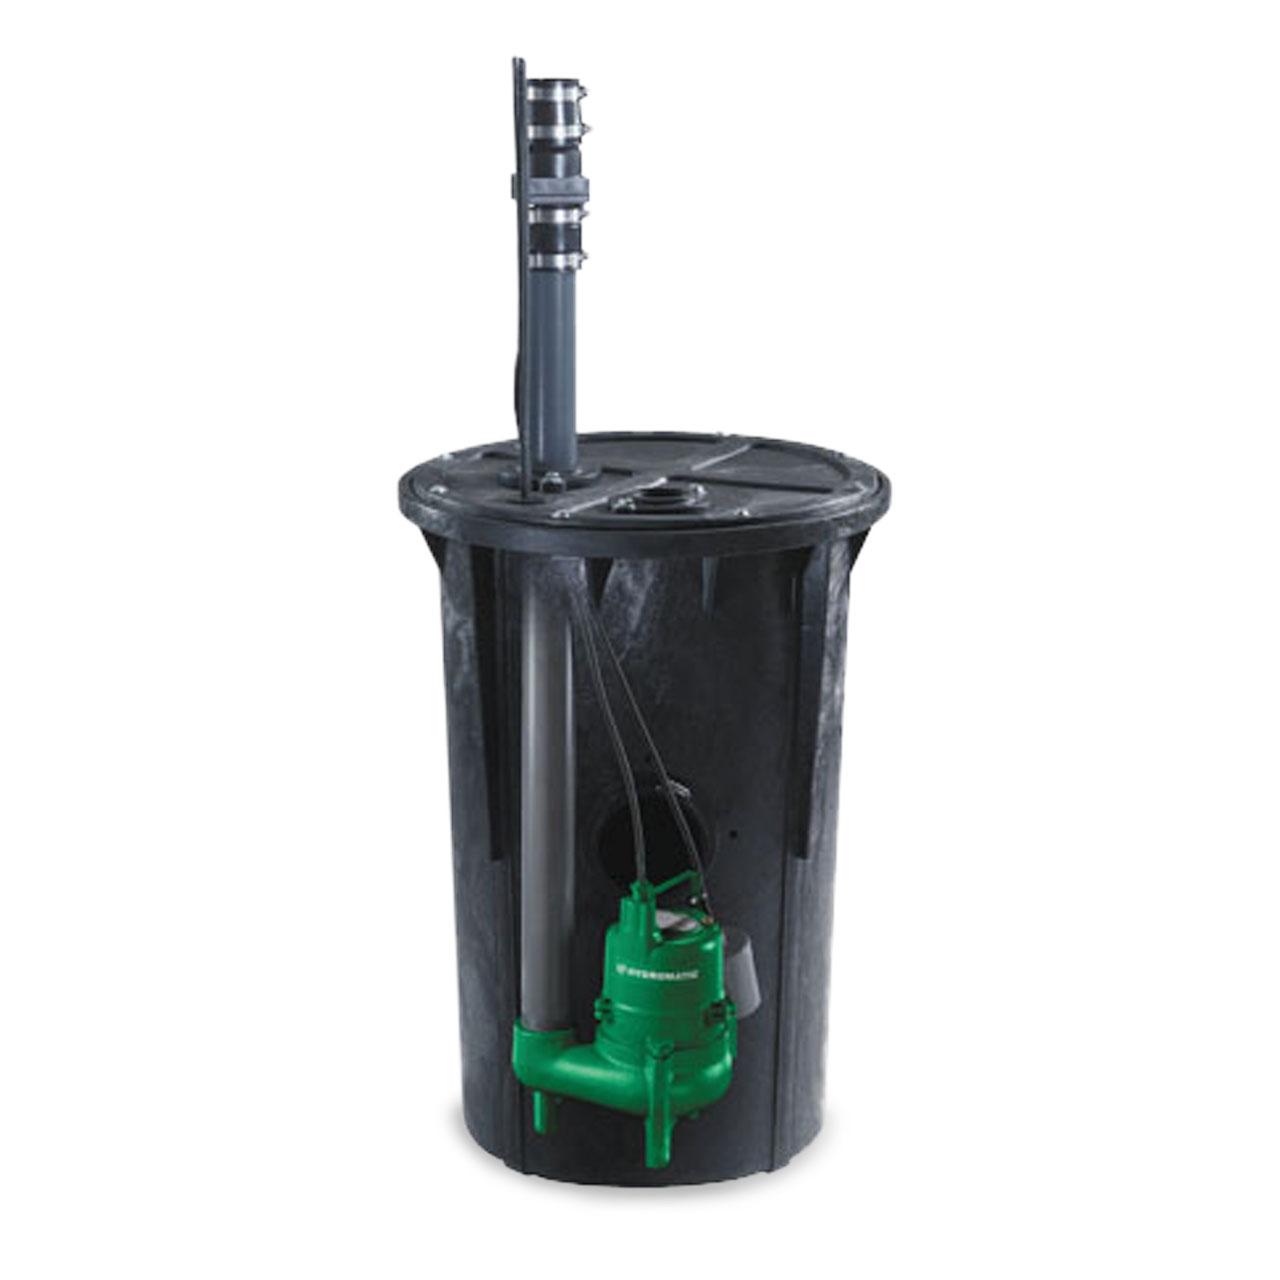 Hydromatic Pump Hydromatic 218 Unassembled Sewage